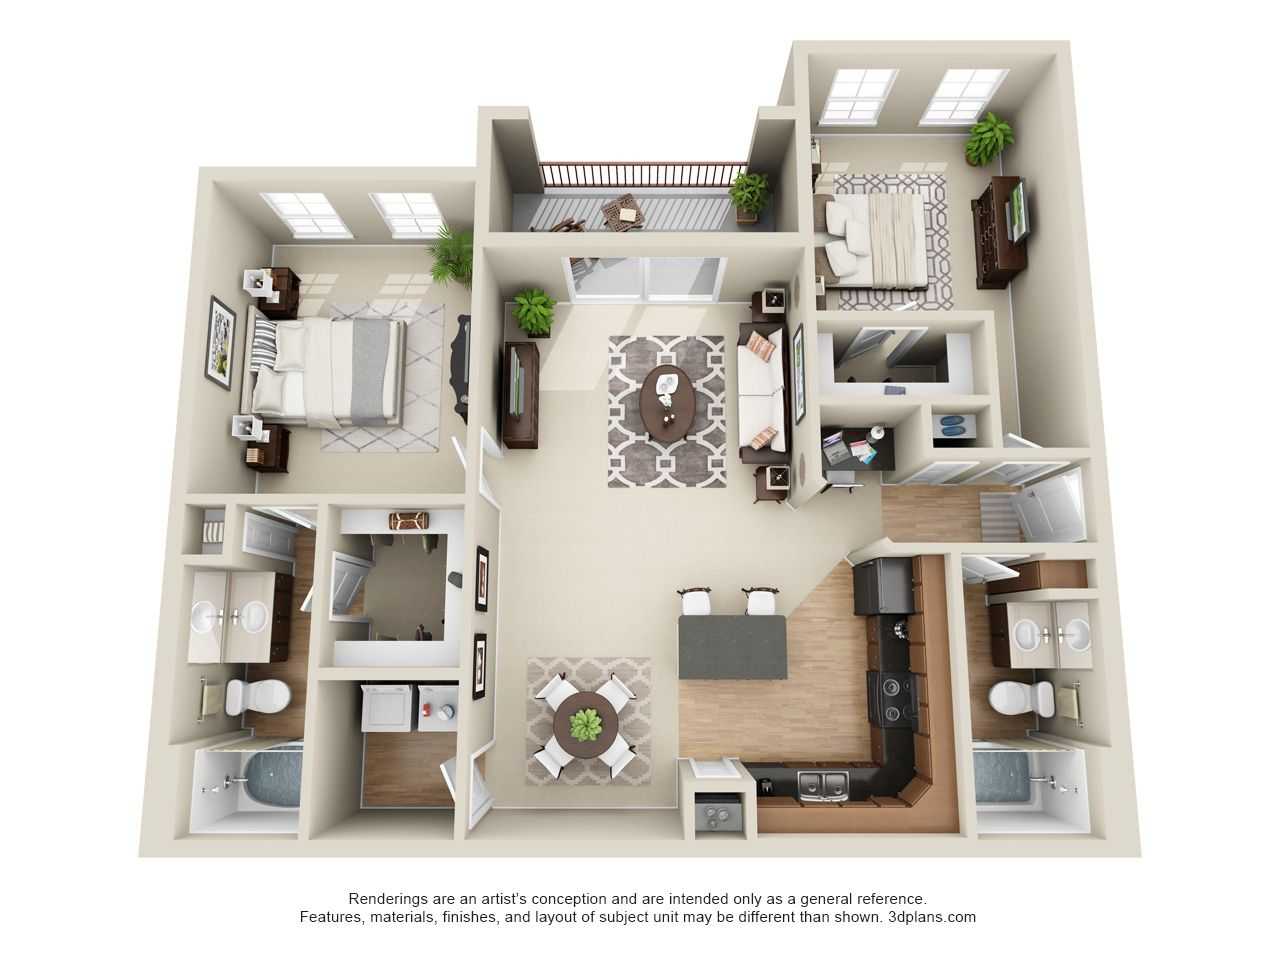 Apartments floor plans - Google Search | Floor plan | Pinterest ...